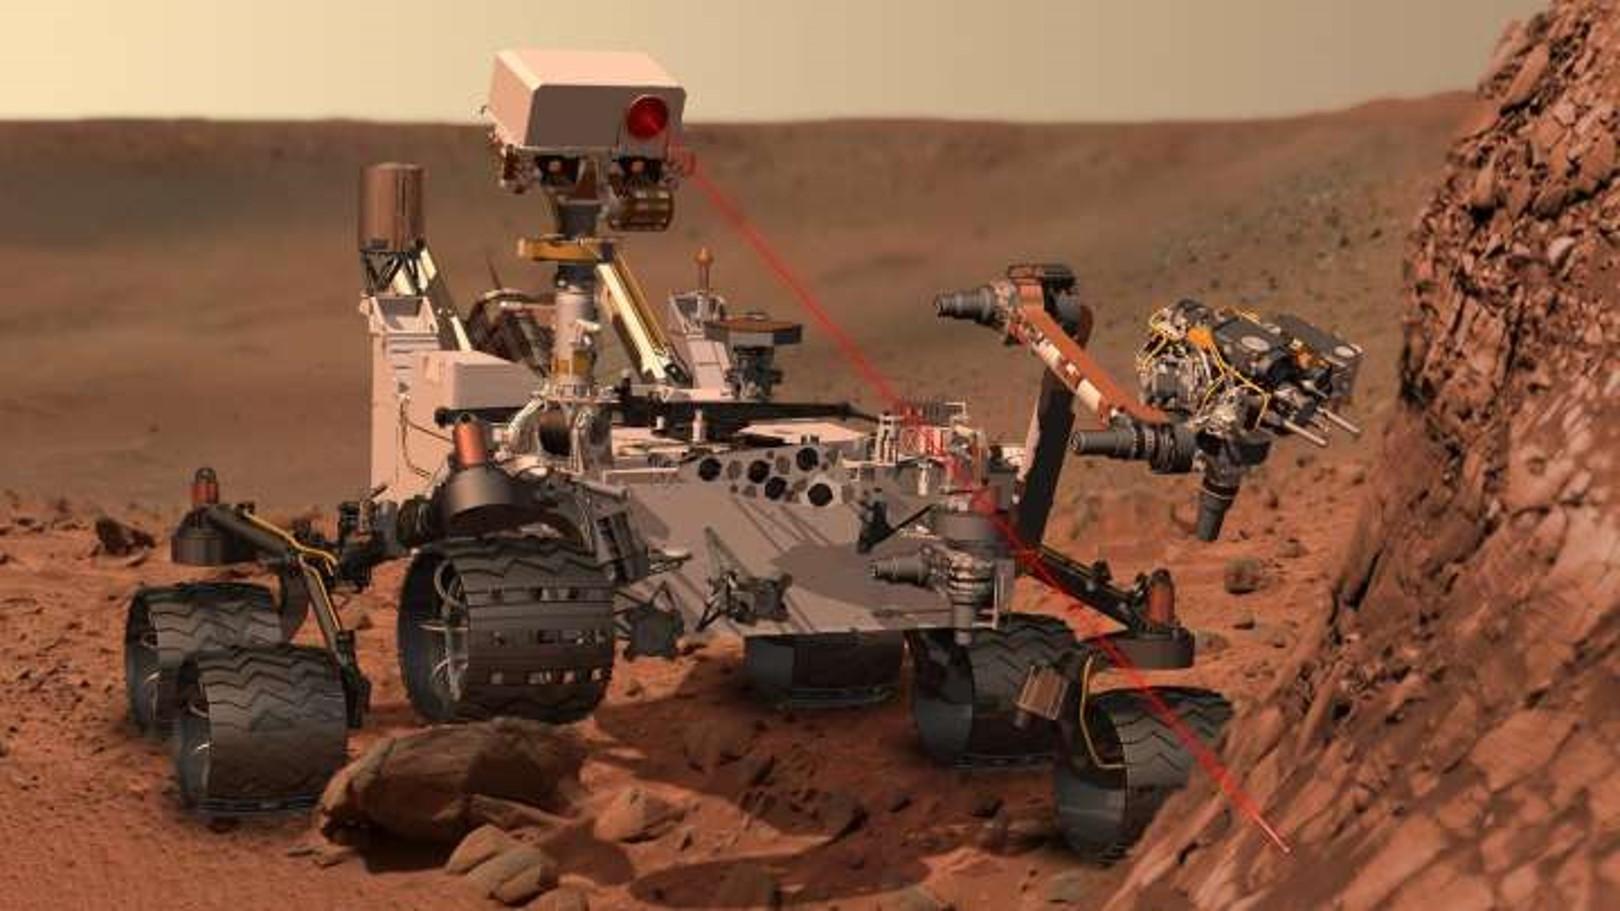 Mars Rover - Artificial Intelligence Applications - Edureka